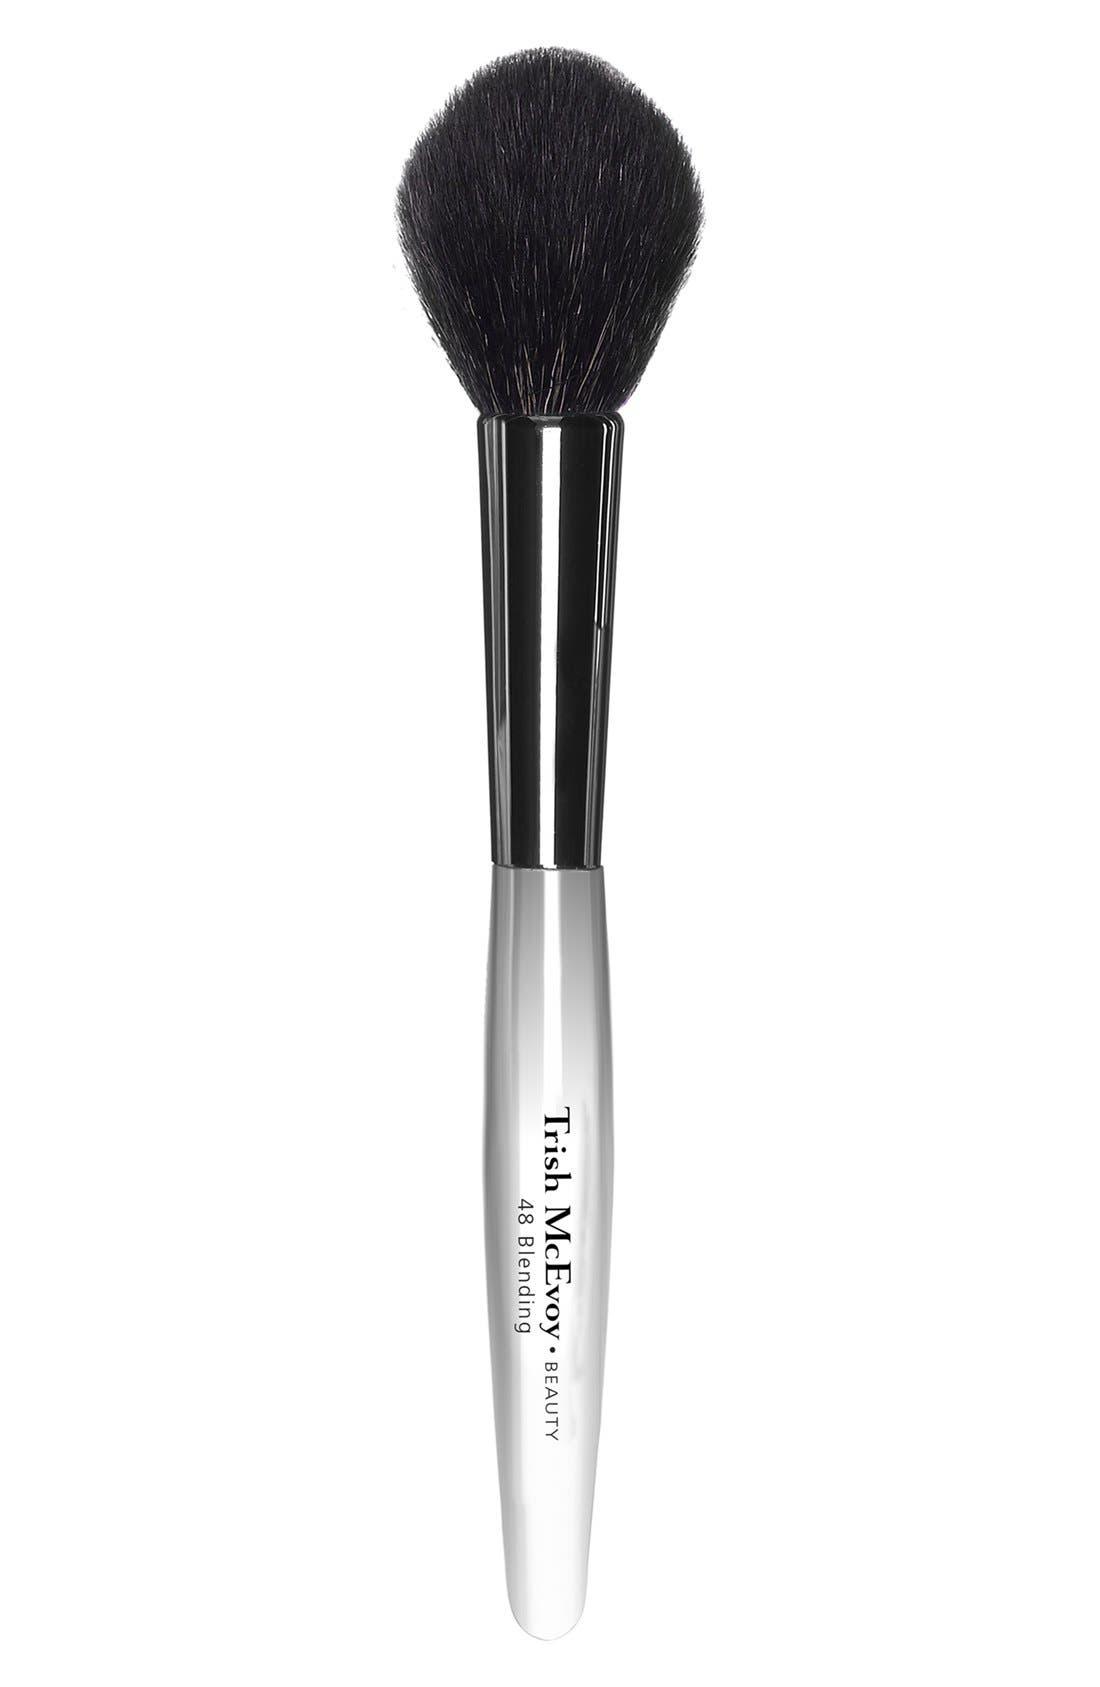 #48 Blending Brush,                         Main,                         color, NO COLOR